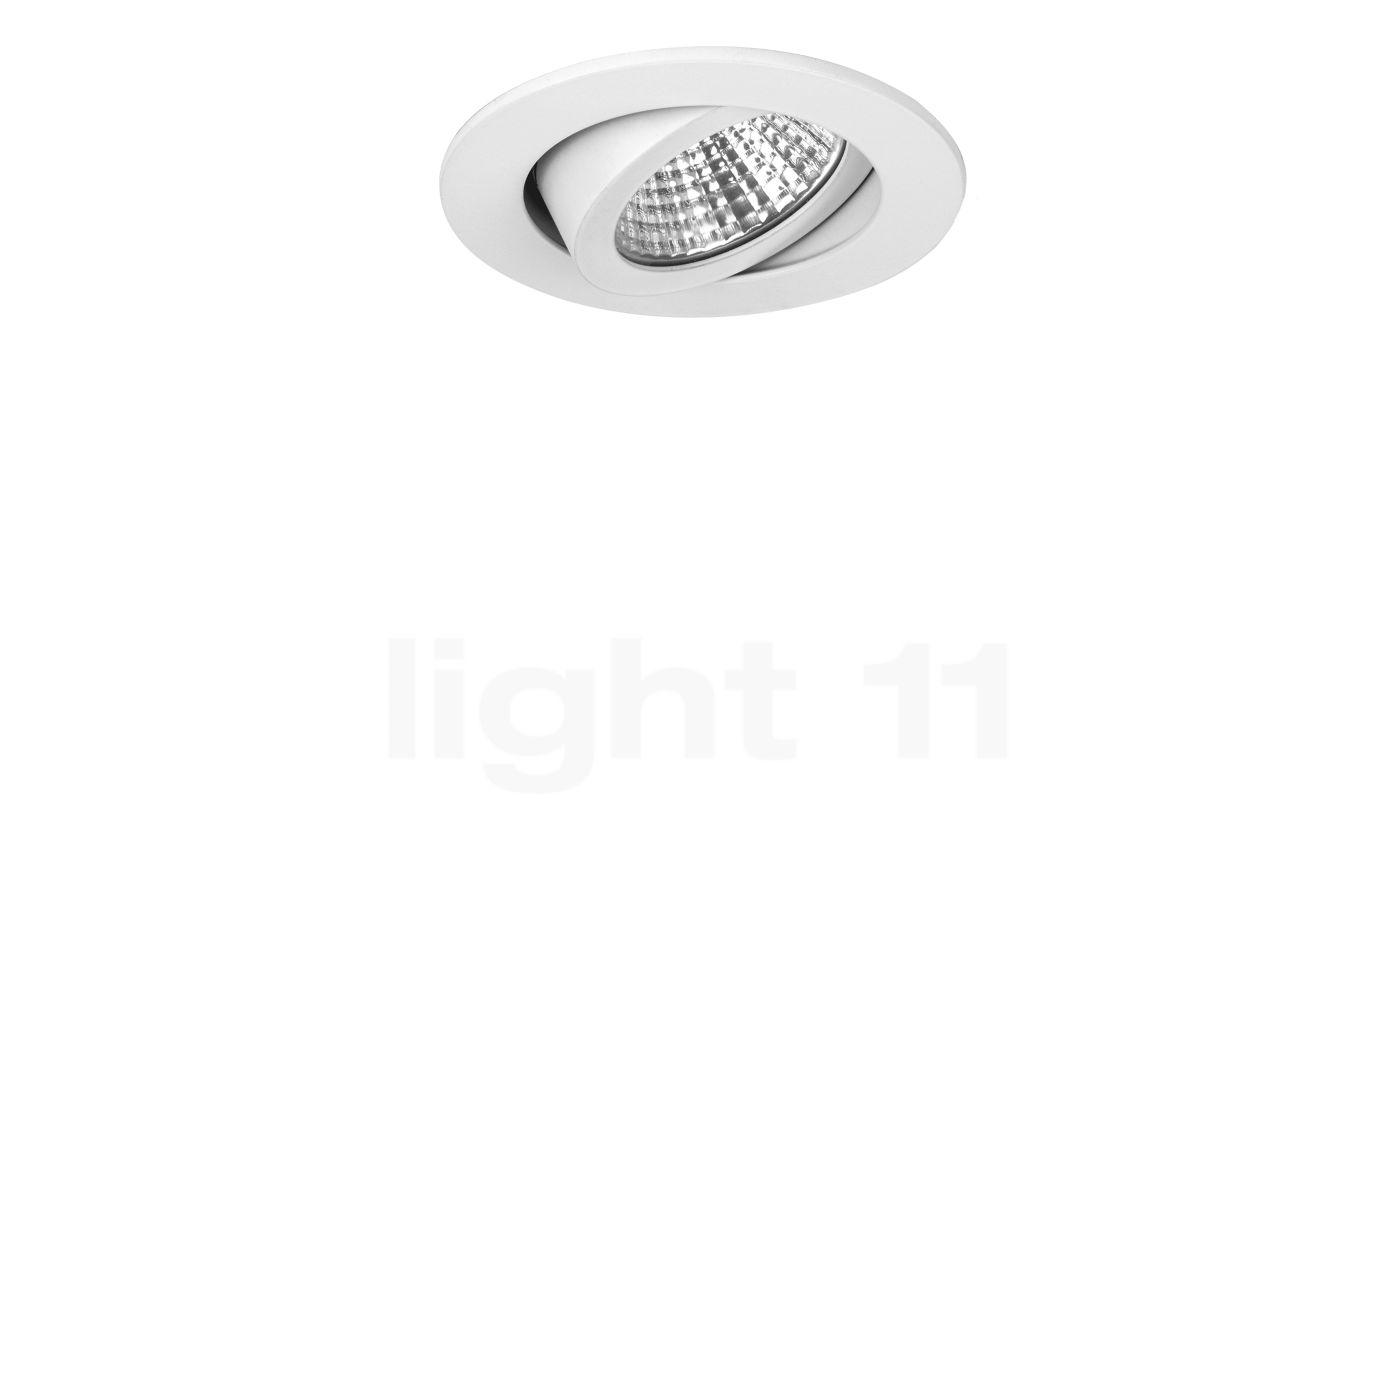 Brumberg 39461 - Einbaustrahler LED dim to warm, weiß 39461073